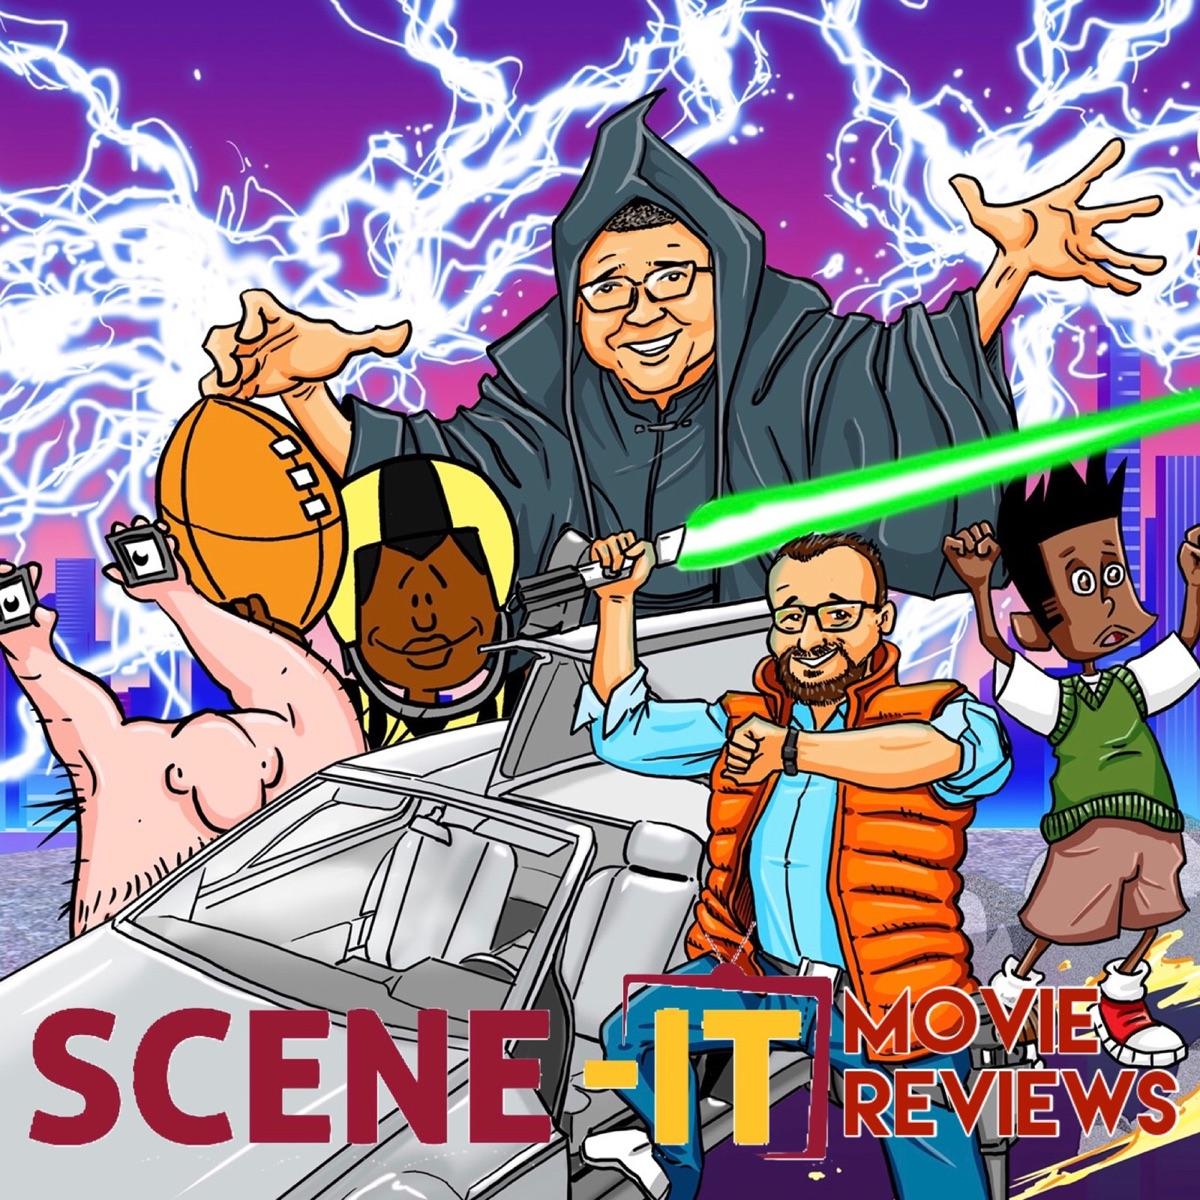 Scene It Movie Reviews Podcast Podtail